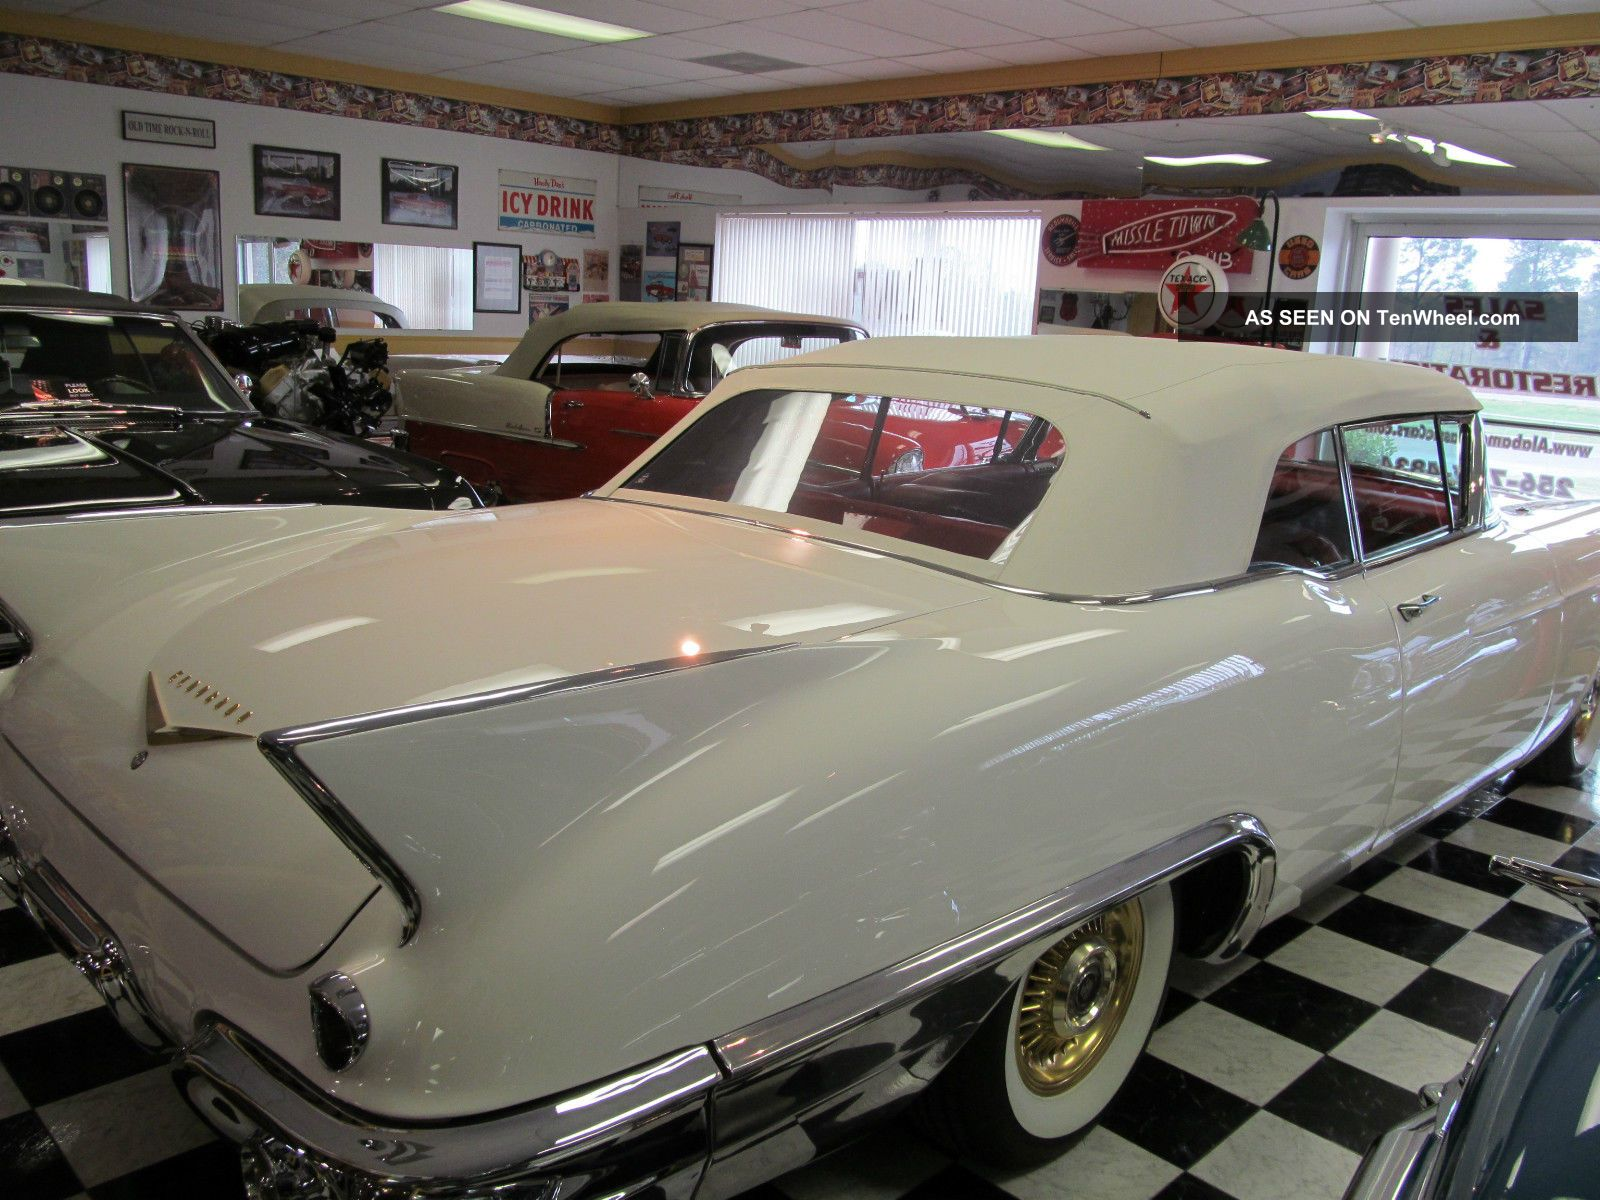 1957 Cadillac Eldorado Biarittz Convertible Eldorado photo